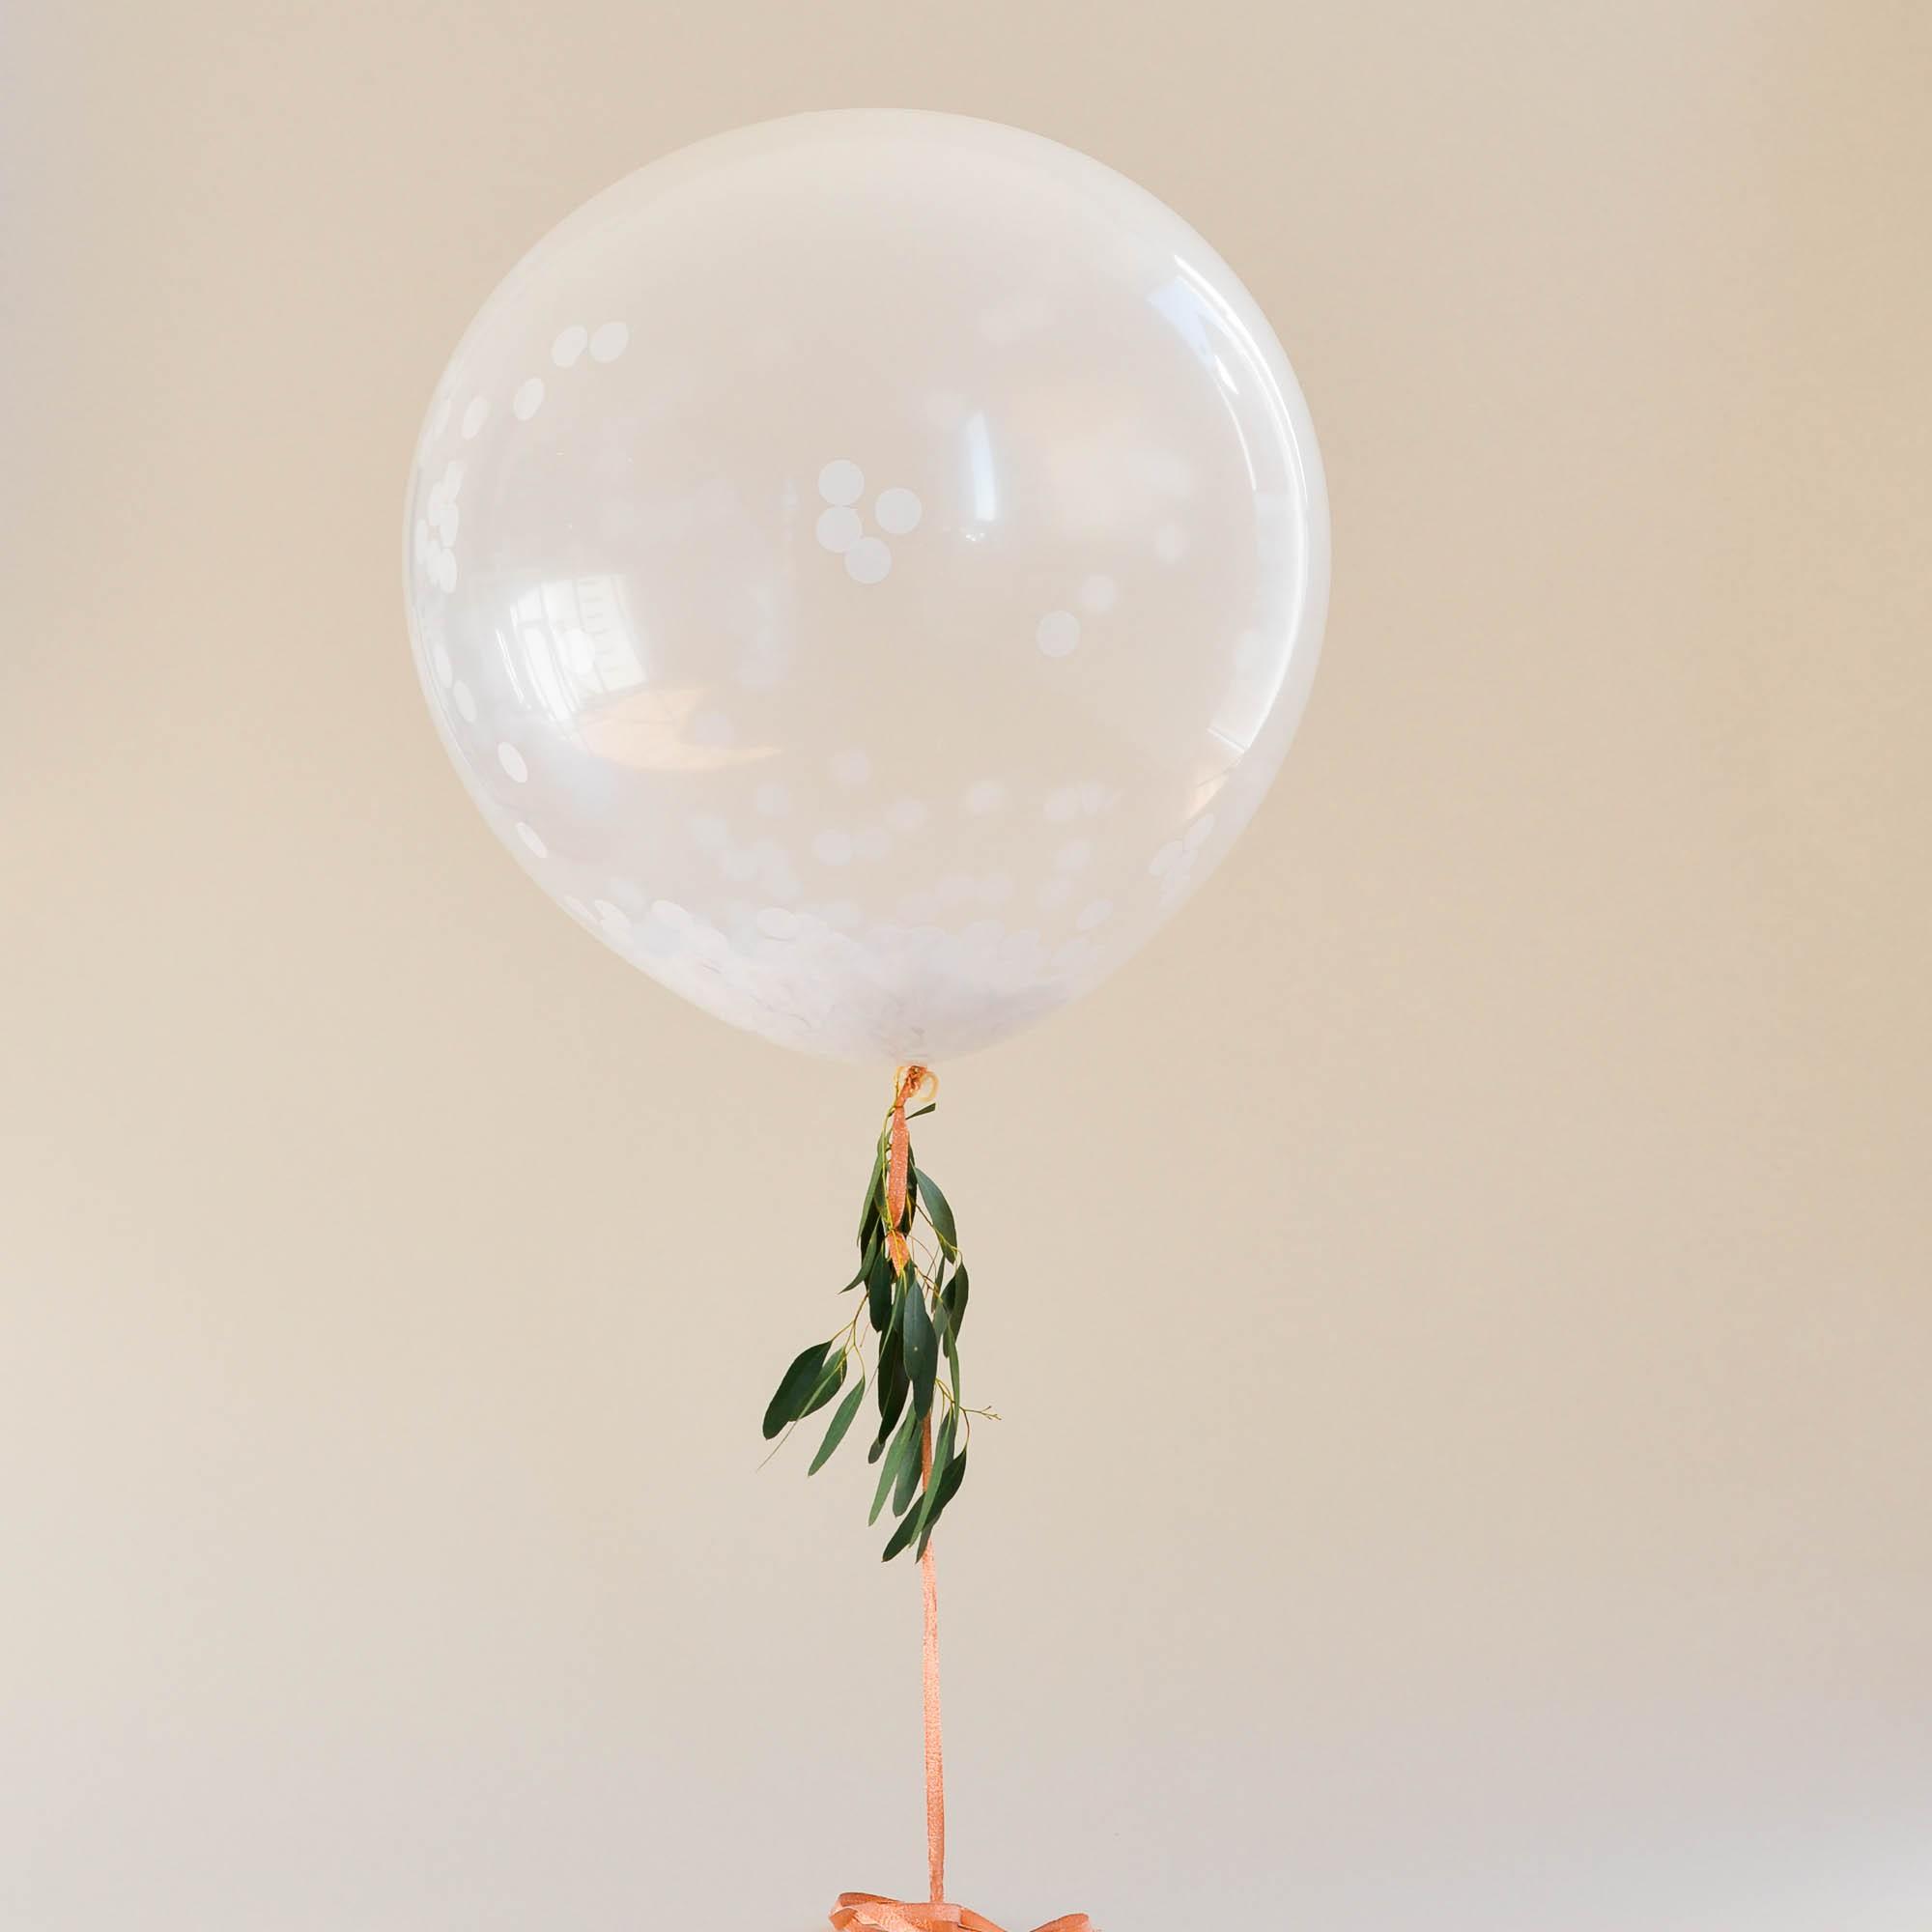 3er Set weiße Konfetti-Ballons